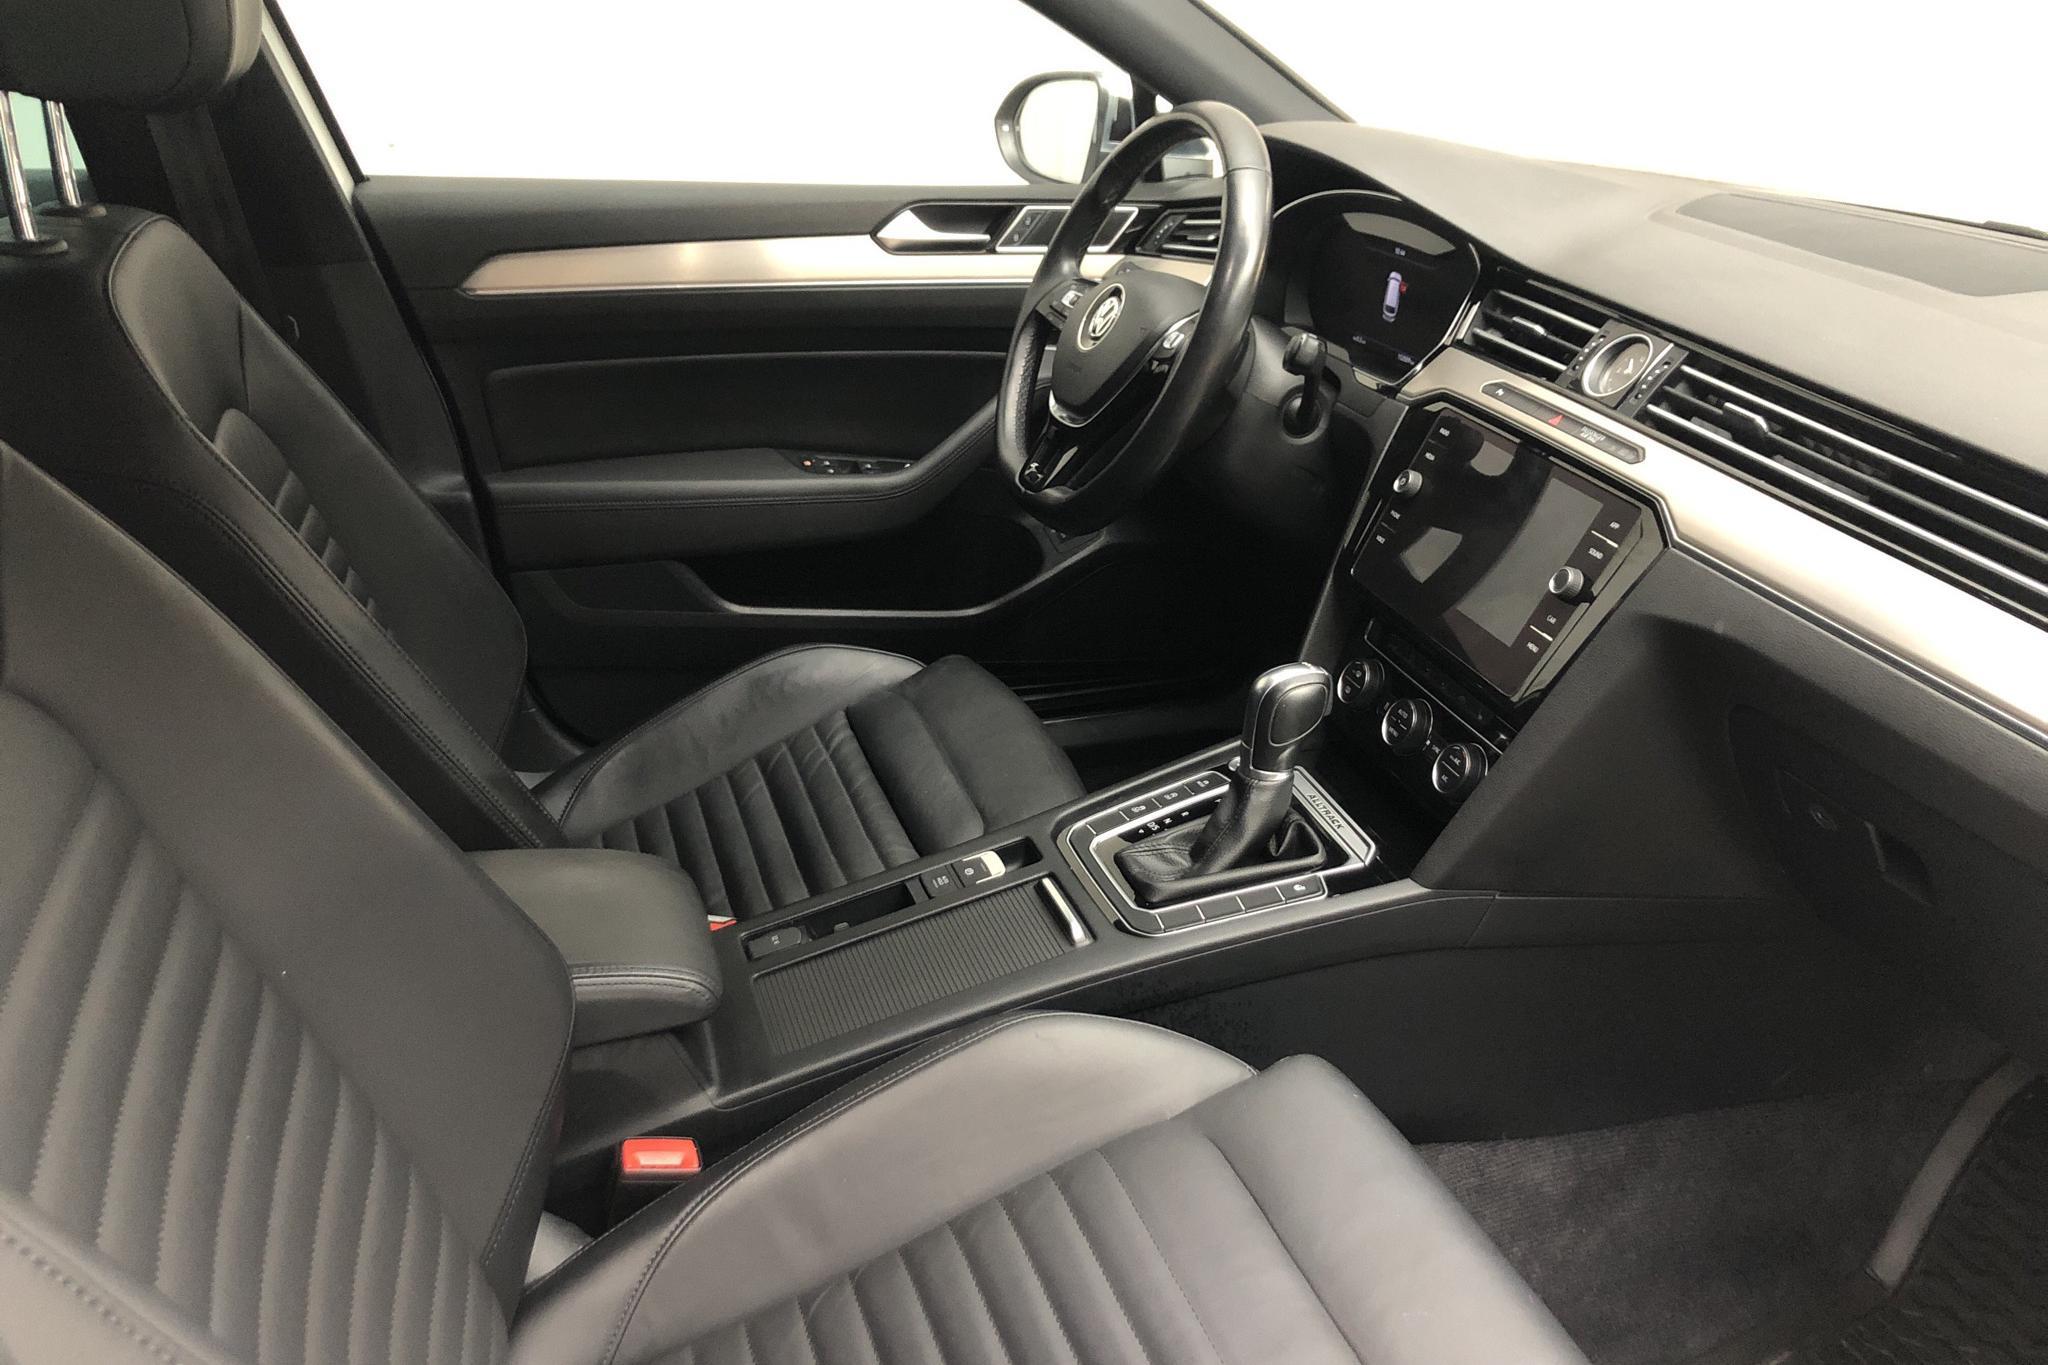 VW Passat Alltrack 2.0 TDI Sportscombi 4MOTION (190hk) - 15 200 mil - Automat - vit - 2018